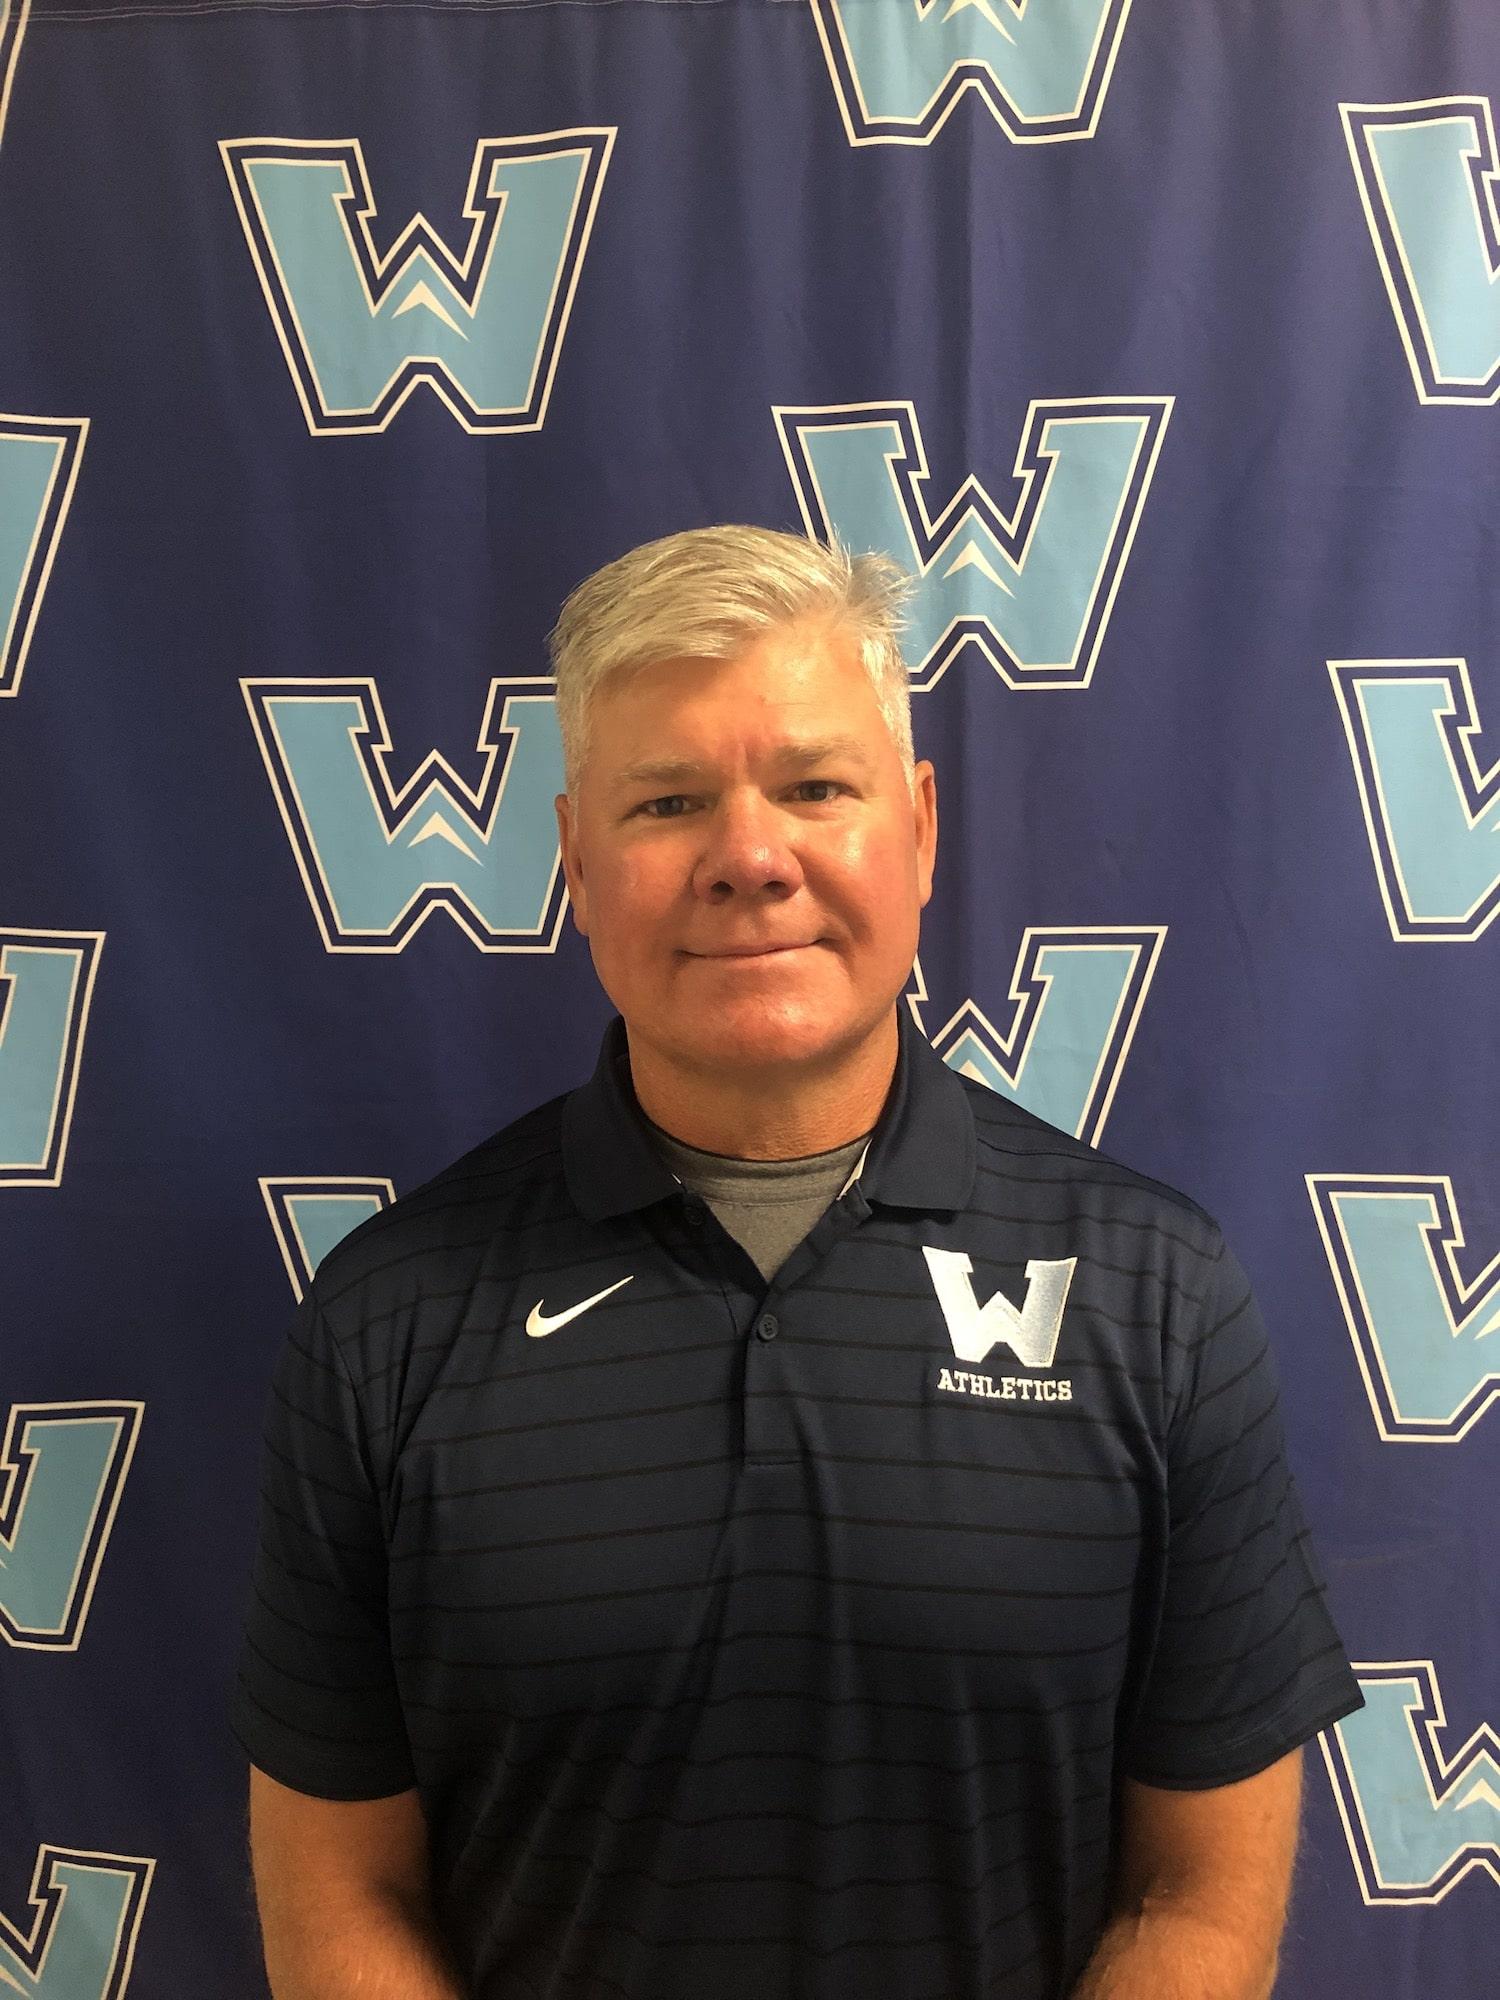 Watauga High School names Michael Windish head baseball coach